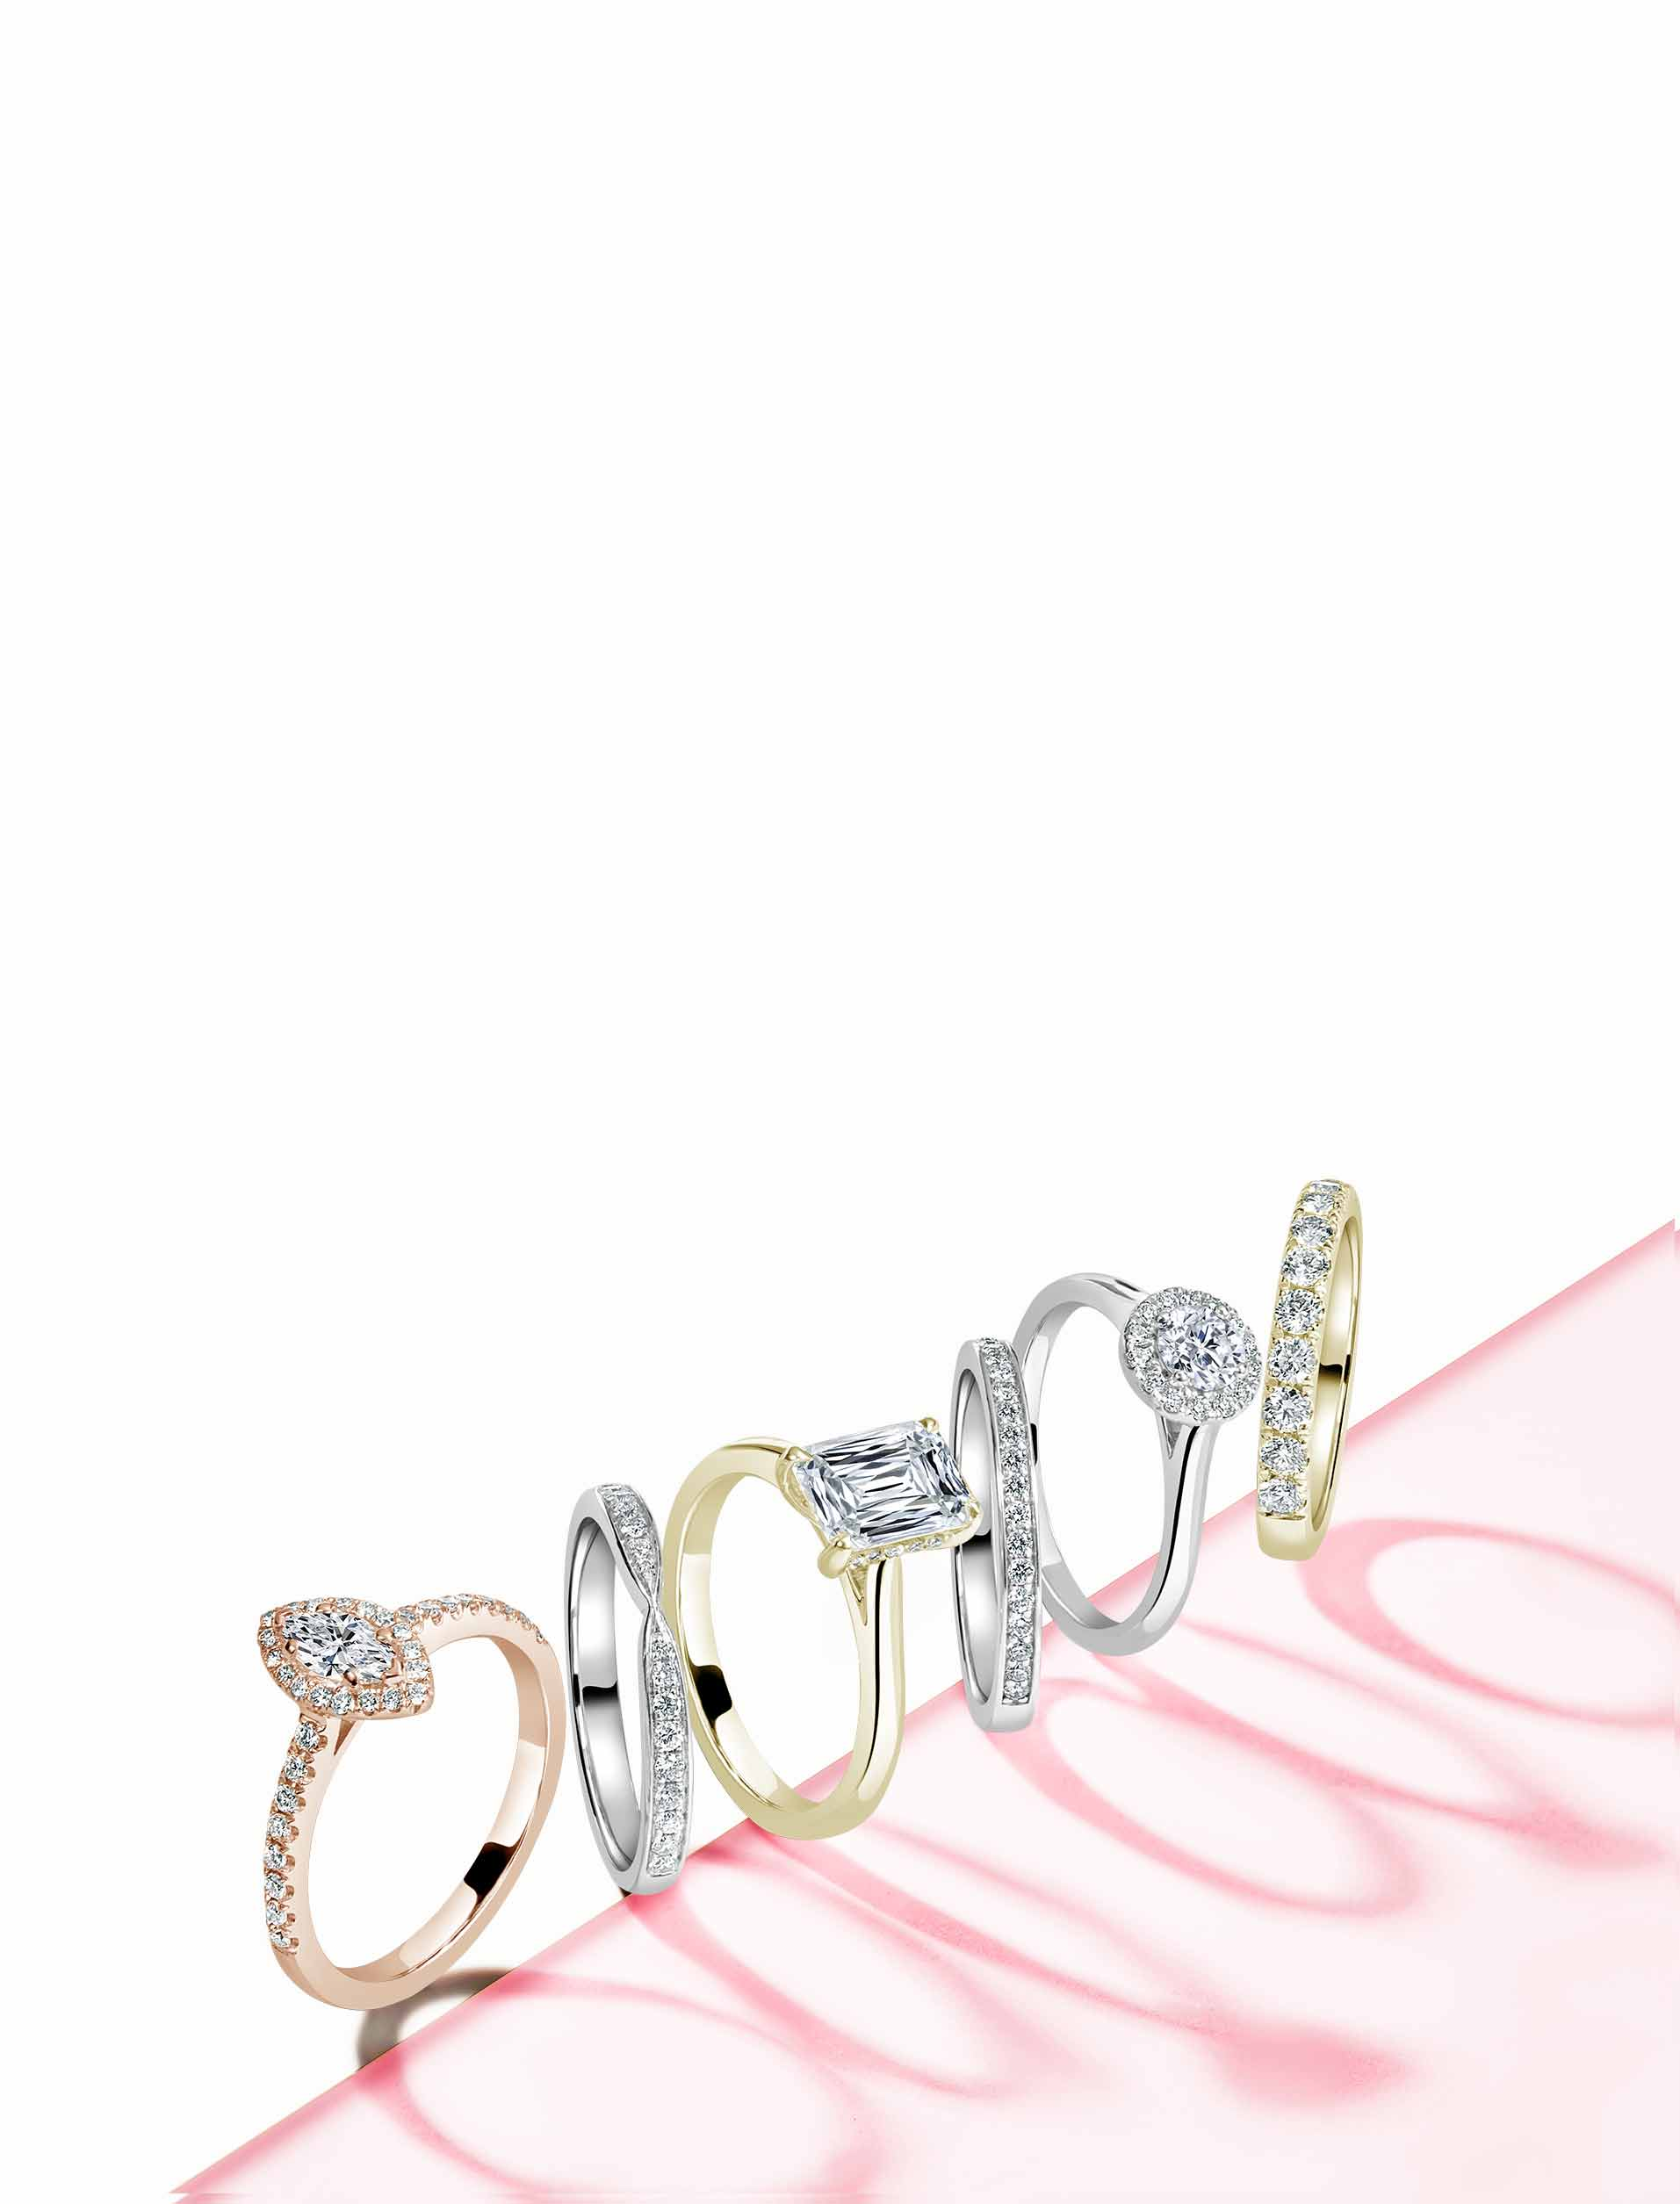 White Gold Emerald Cut Engagement Rings - Steven Stone